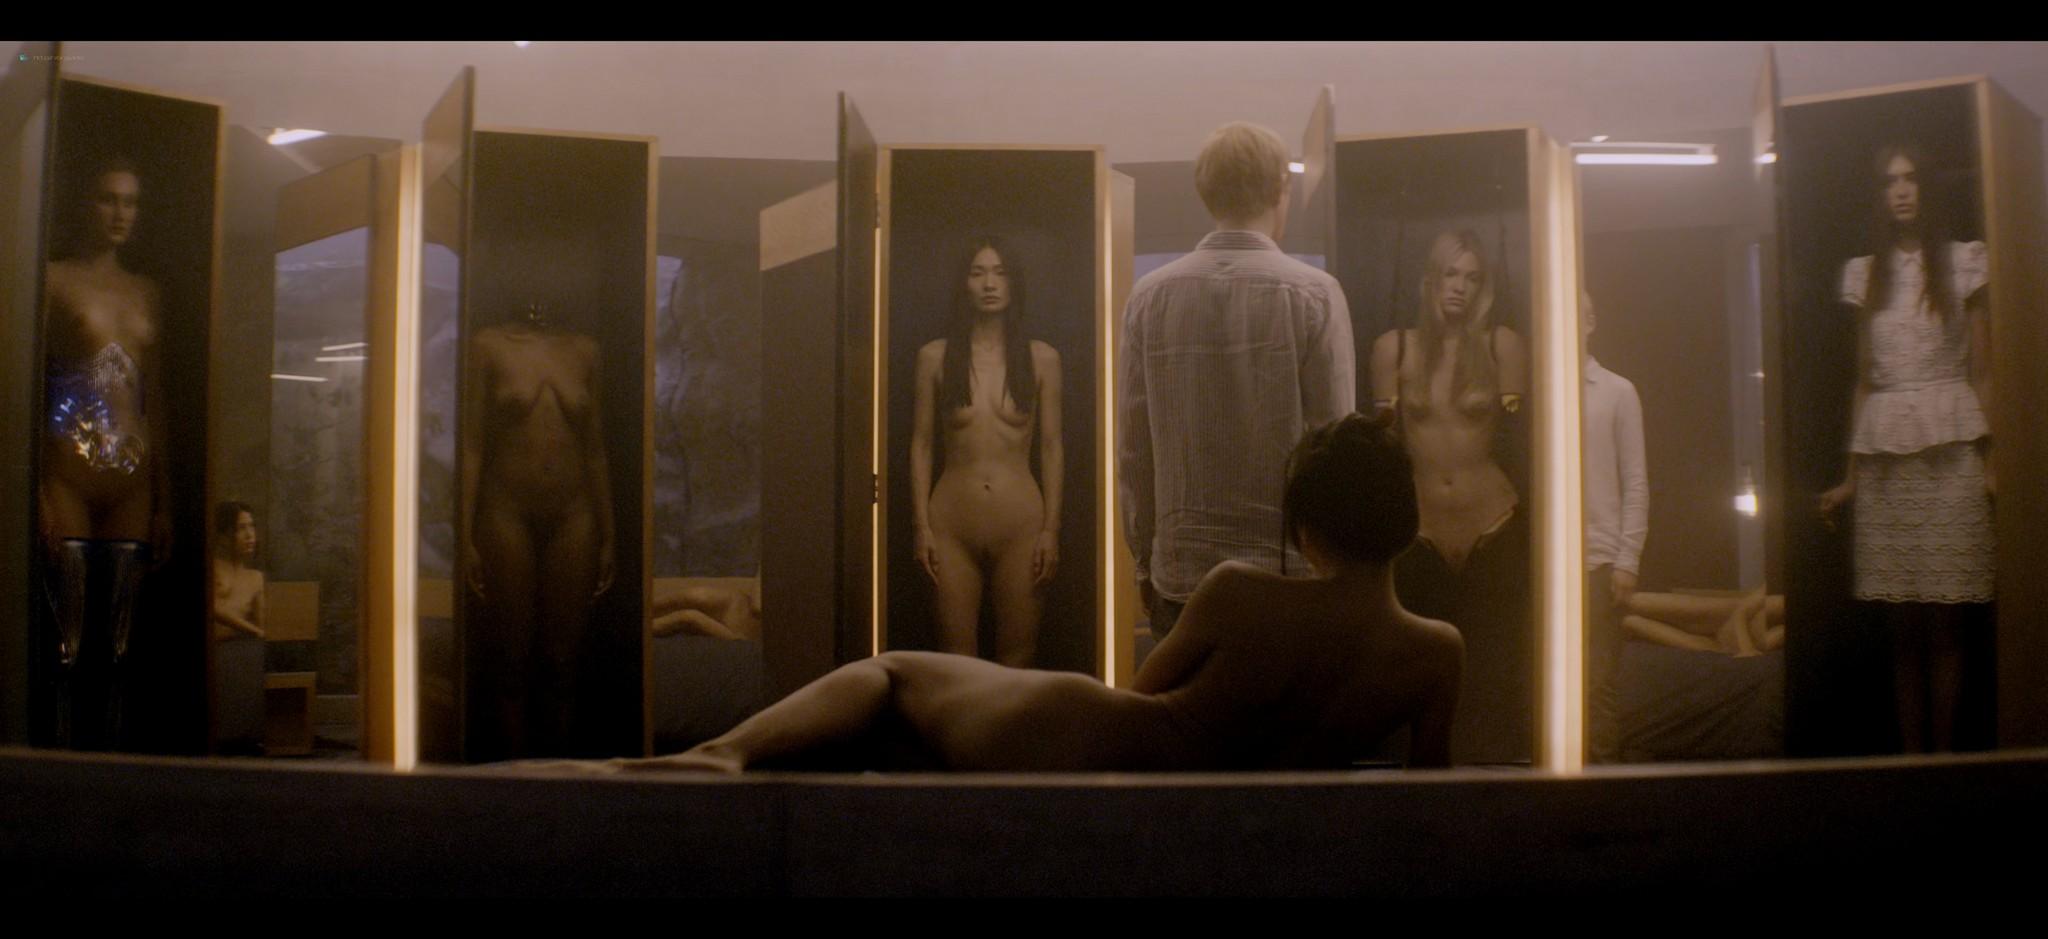 Alicia Vikander nude full frontal Sonoya Mizuno nude bush and others nude Ex Machina 2015 UHD 2160 1080p 010